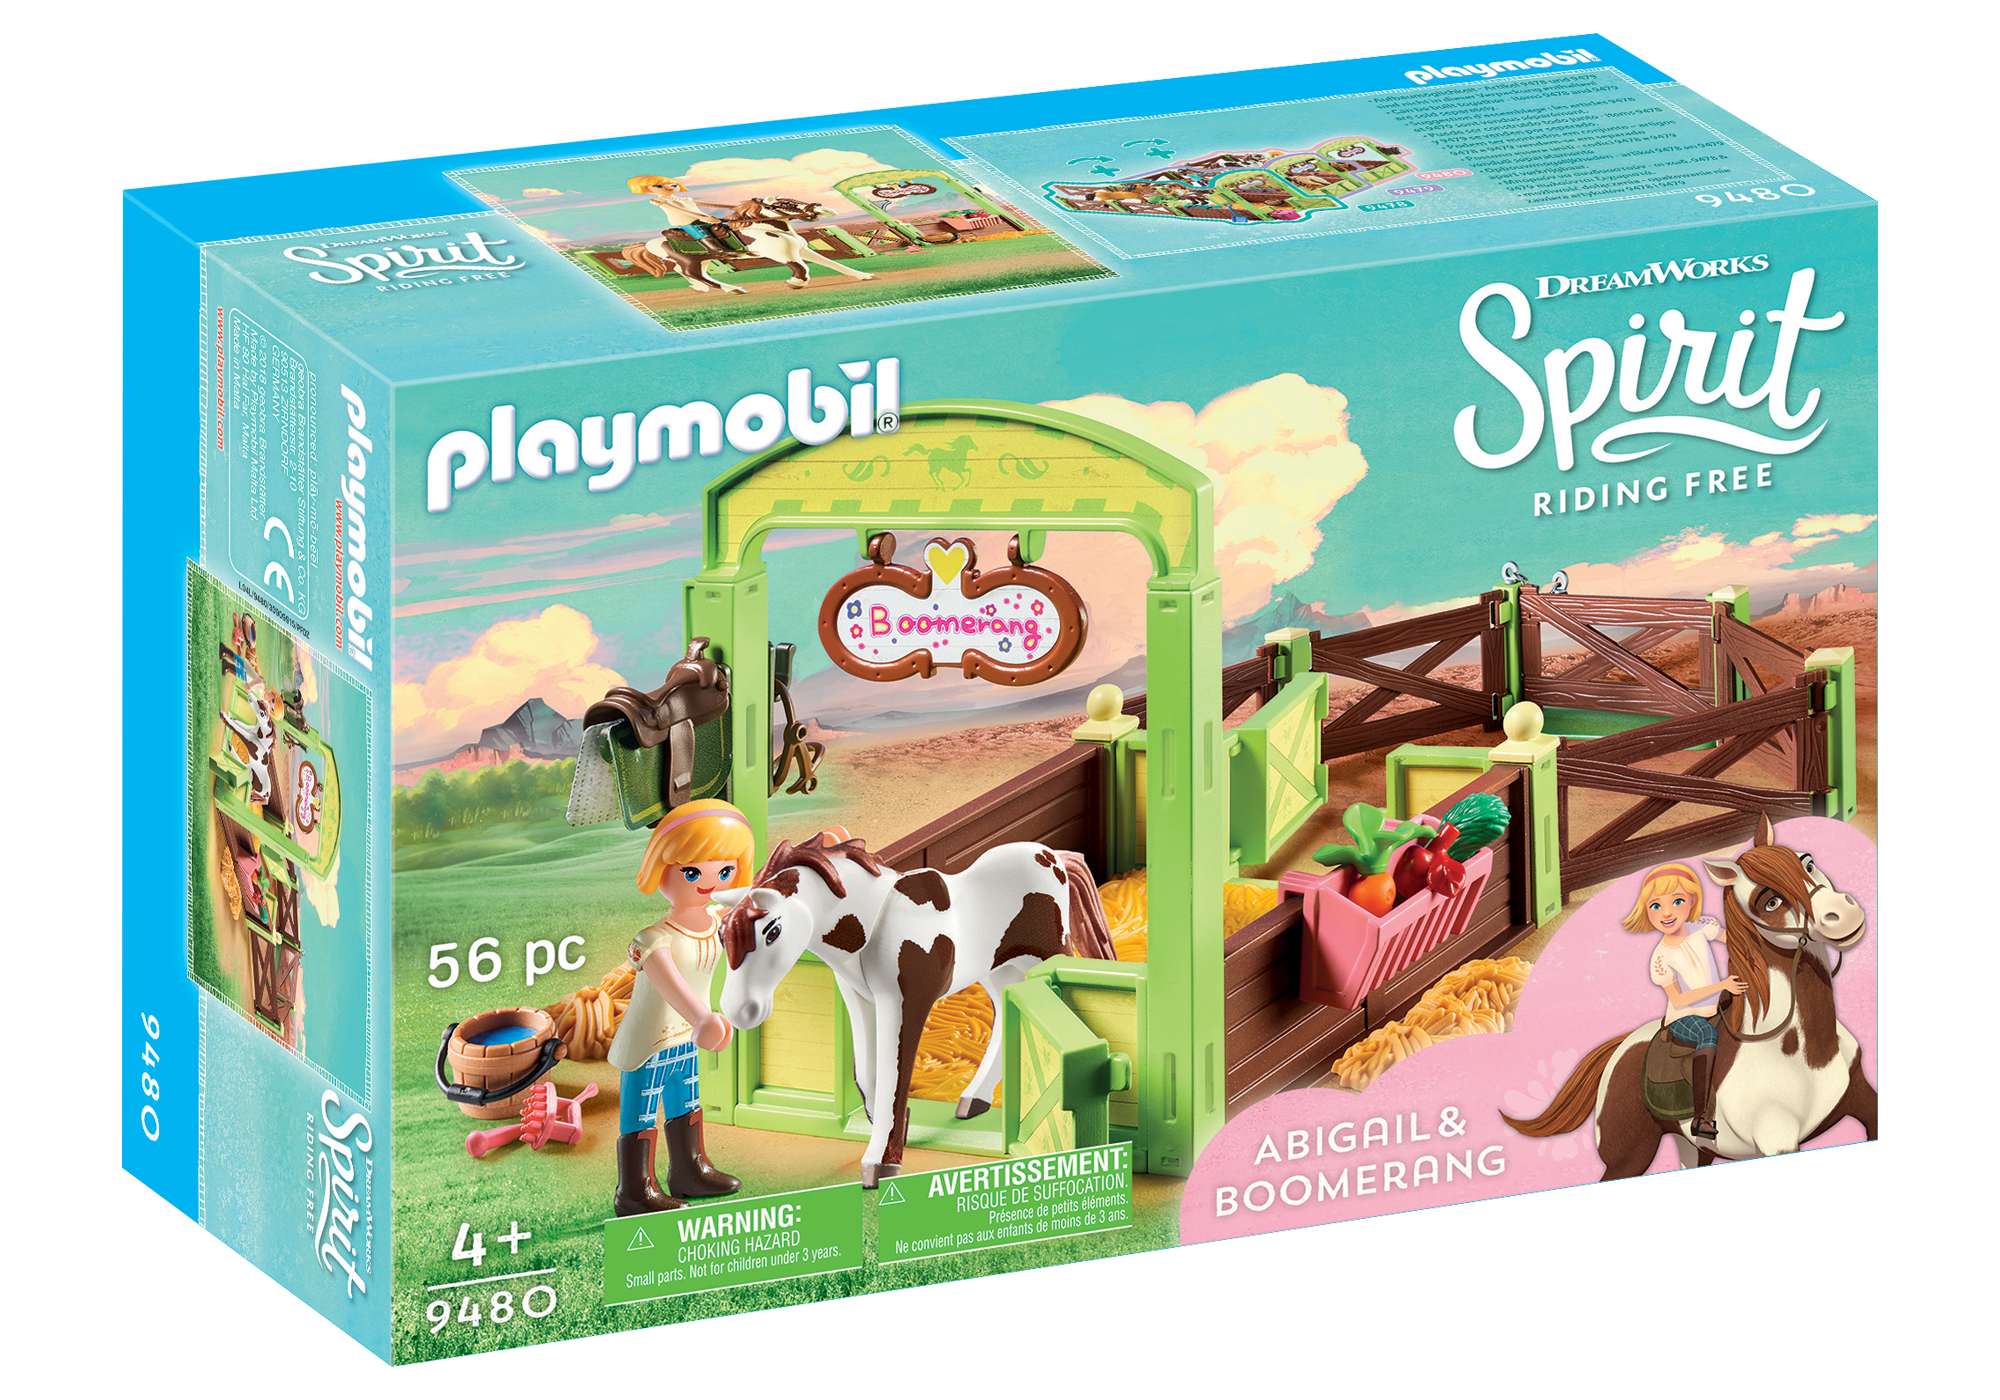 http://media.playmobil.com/i/playmobil/9480_product_box_front/Abigail & Boomerang met paardenbox